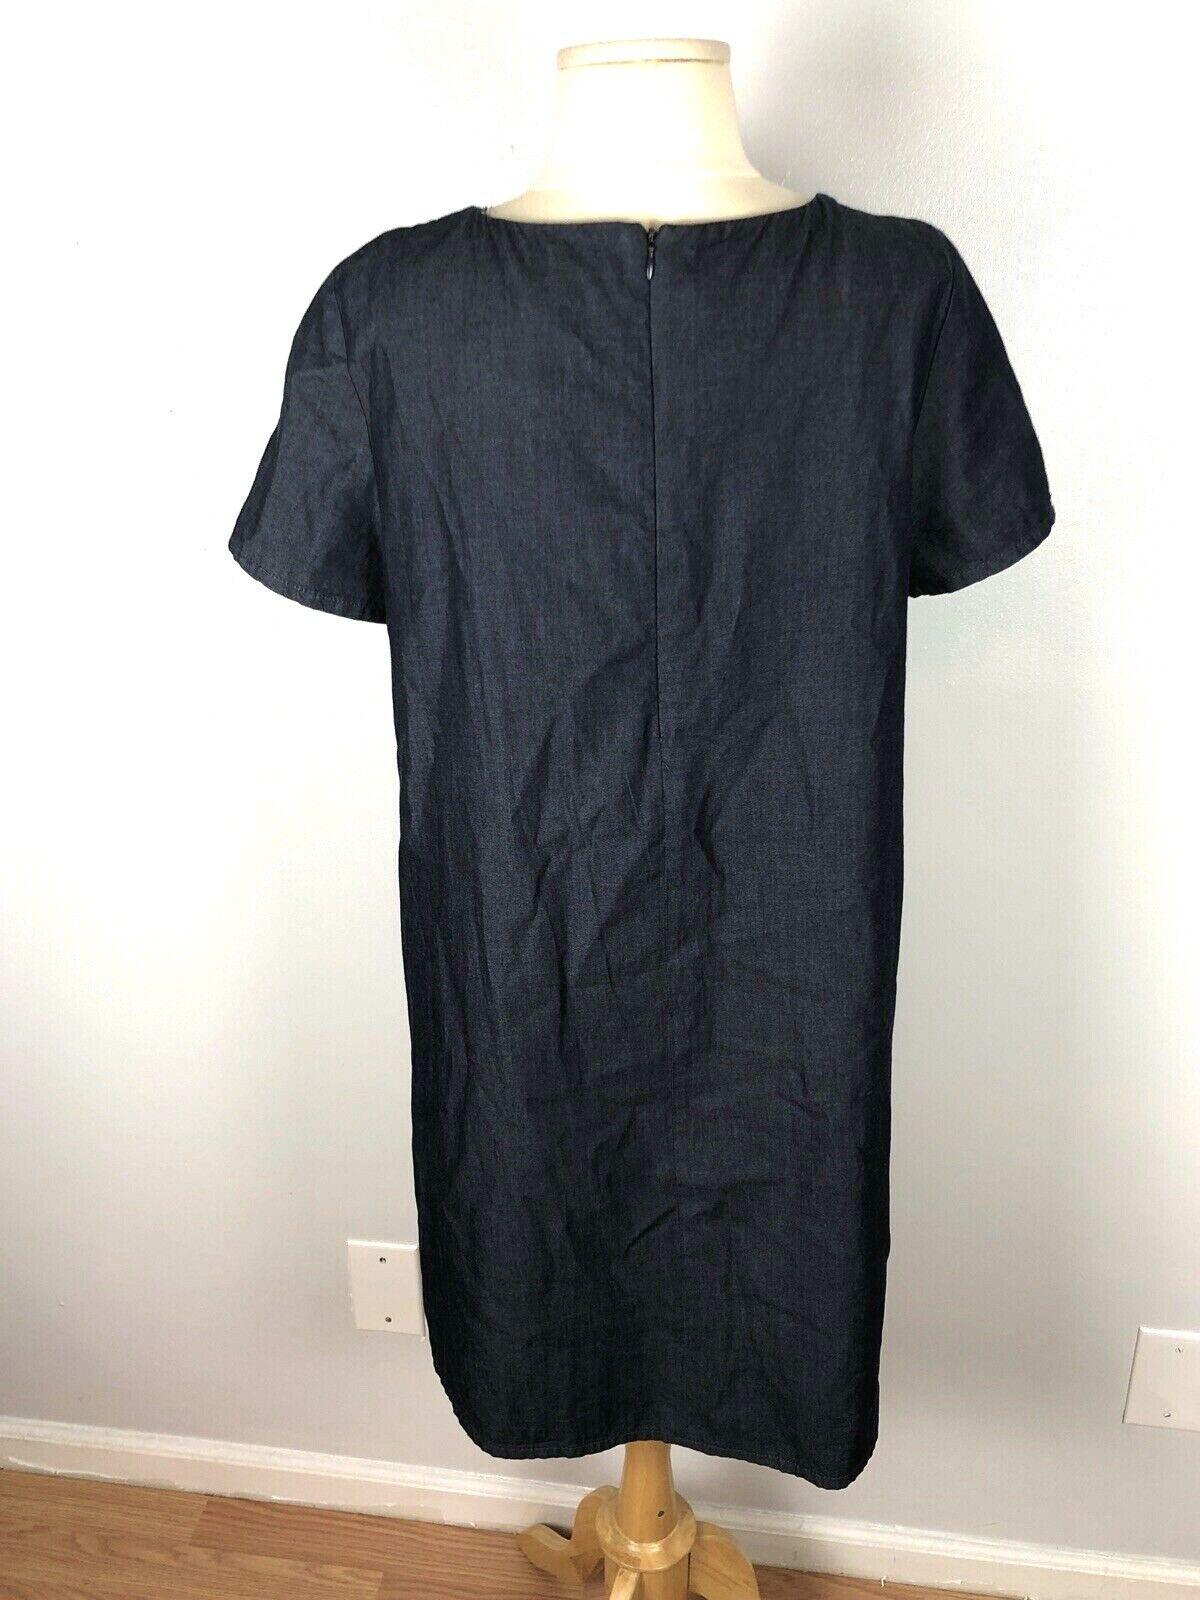 Zara Basic Denim Dark Wash Swing Dress, Size L - image 5